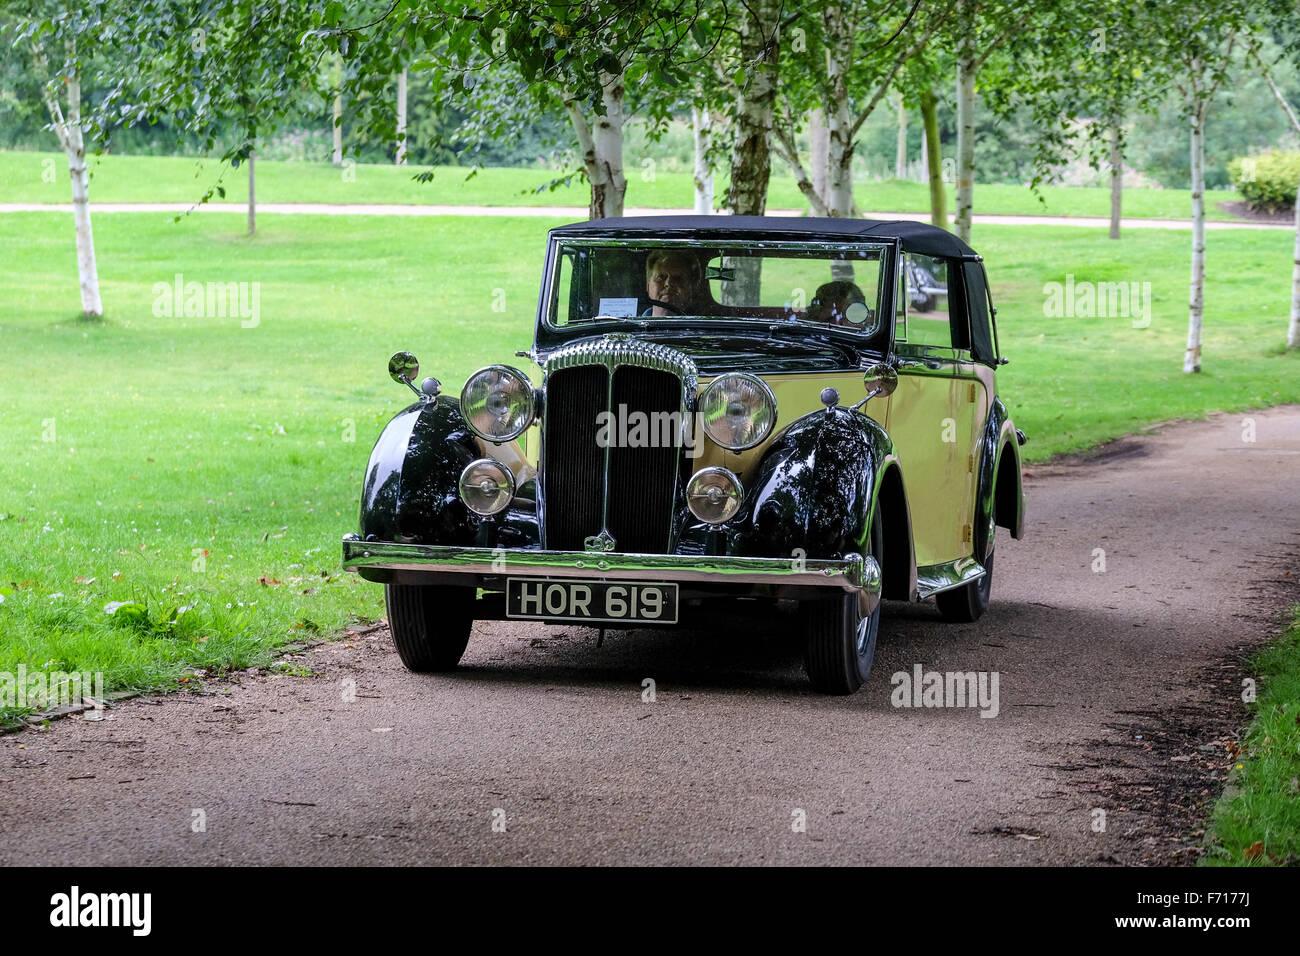 1947 Daimler motor car - Stock Image